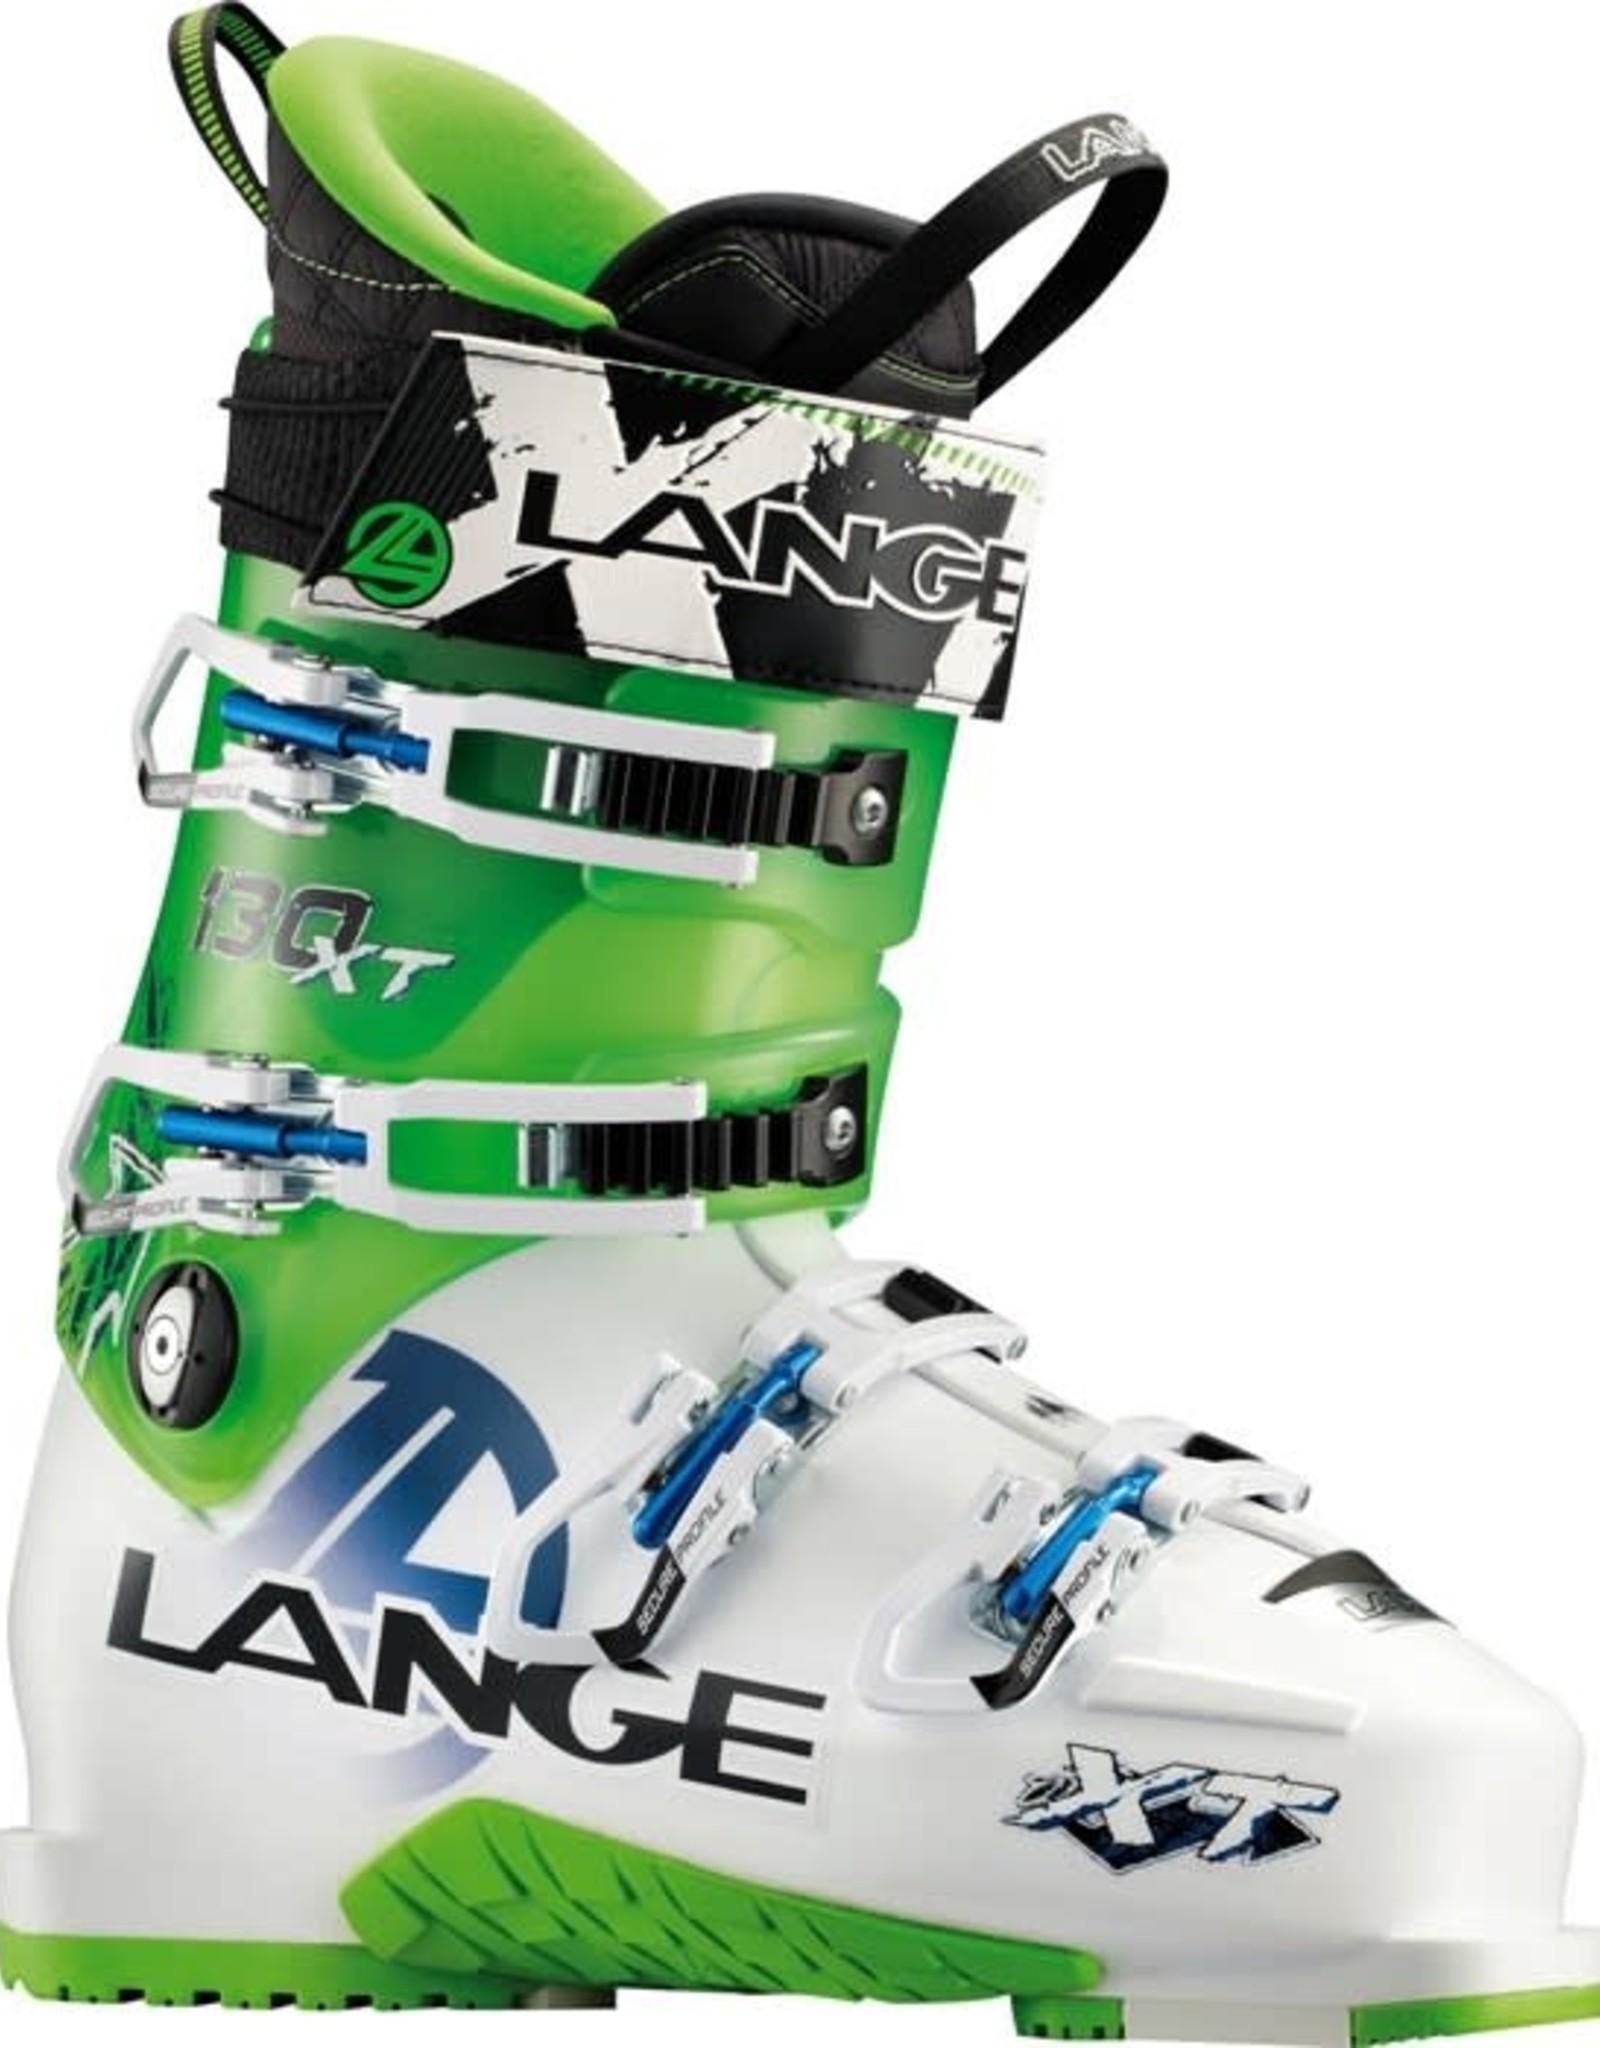 Lange LANGE Ski Boots XT 130 (13/14)